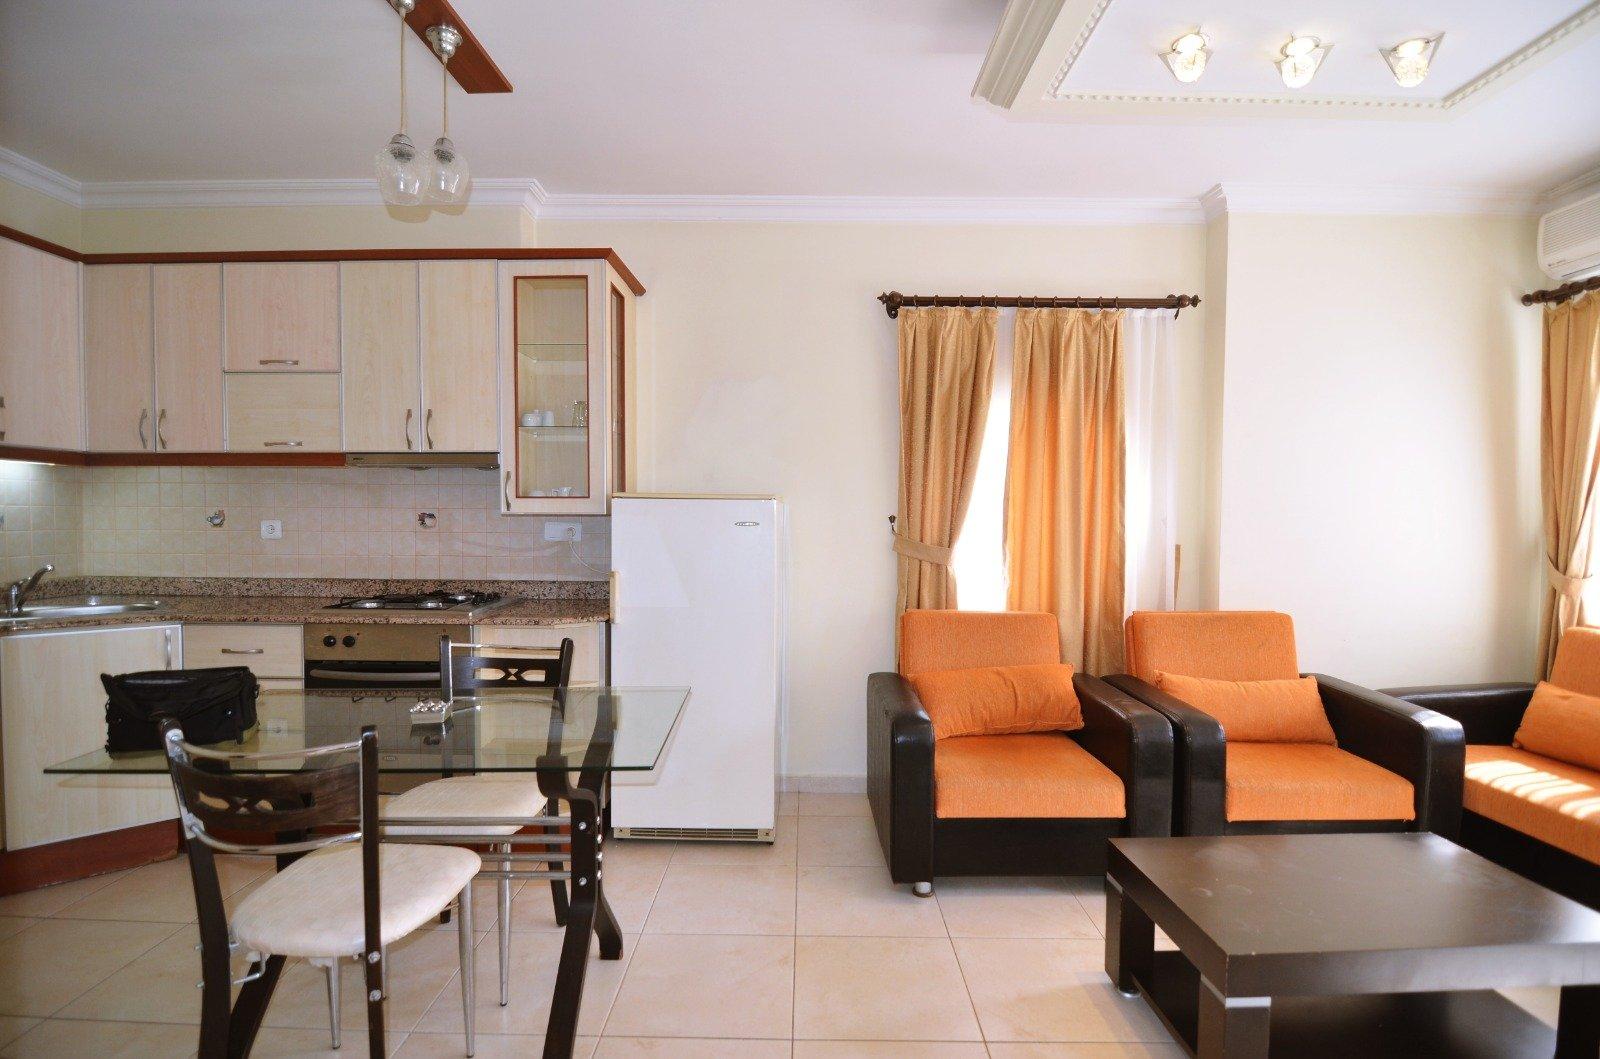 1+1 Квартира в центре города с инфраструкторой на территории  комплекса